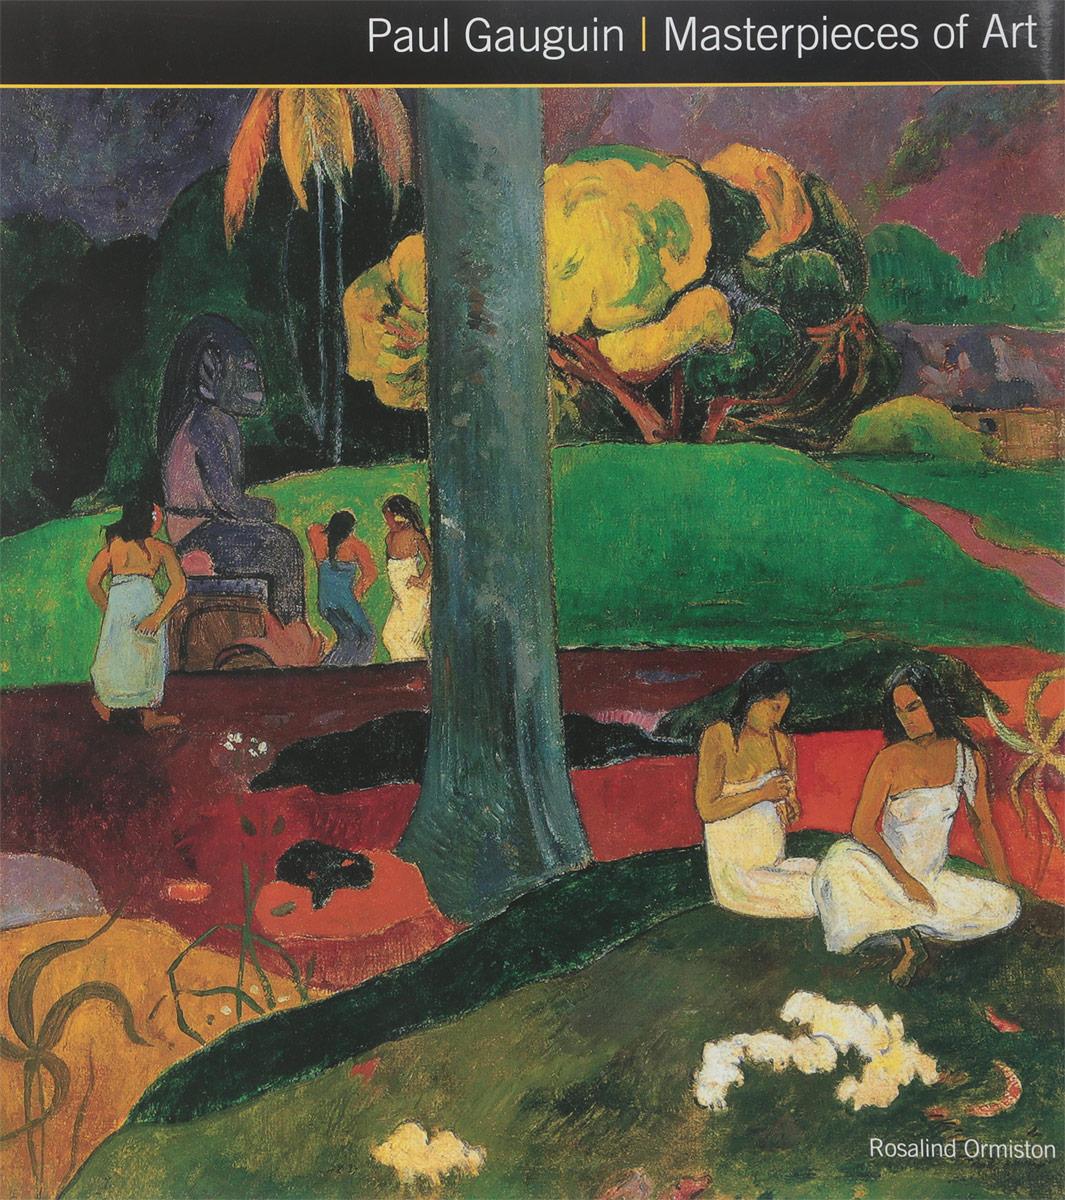 Paul Gauguin / Masterpieces of Art gauguin the other world